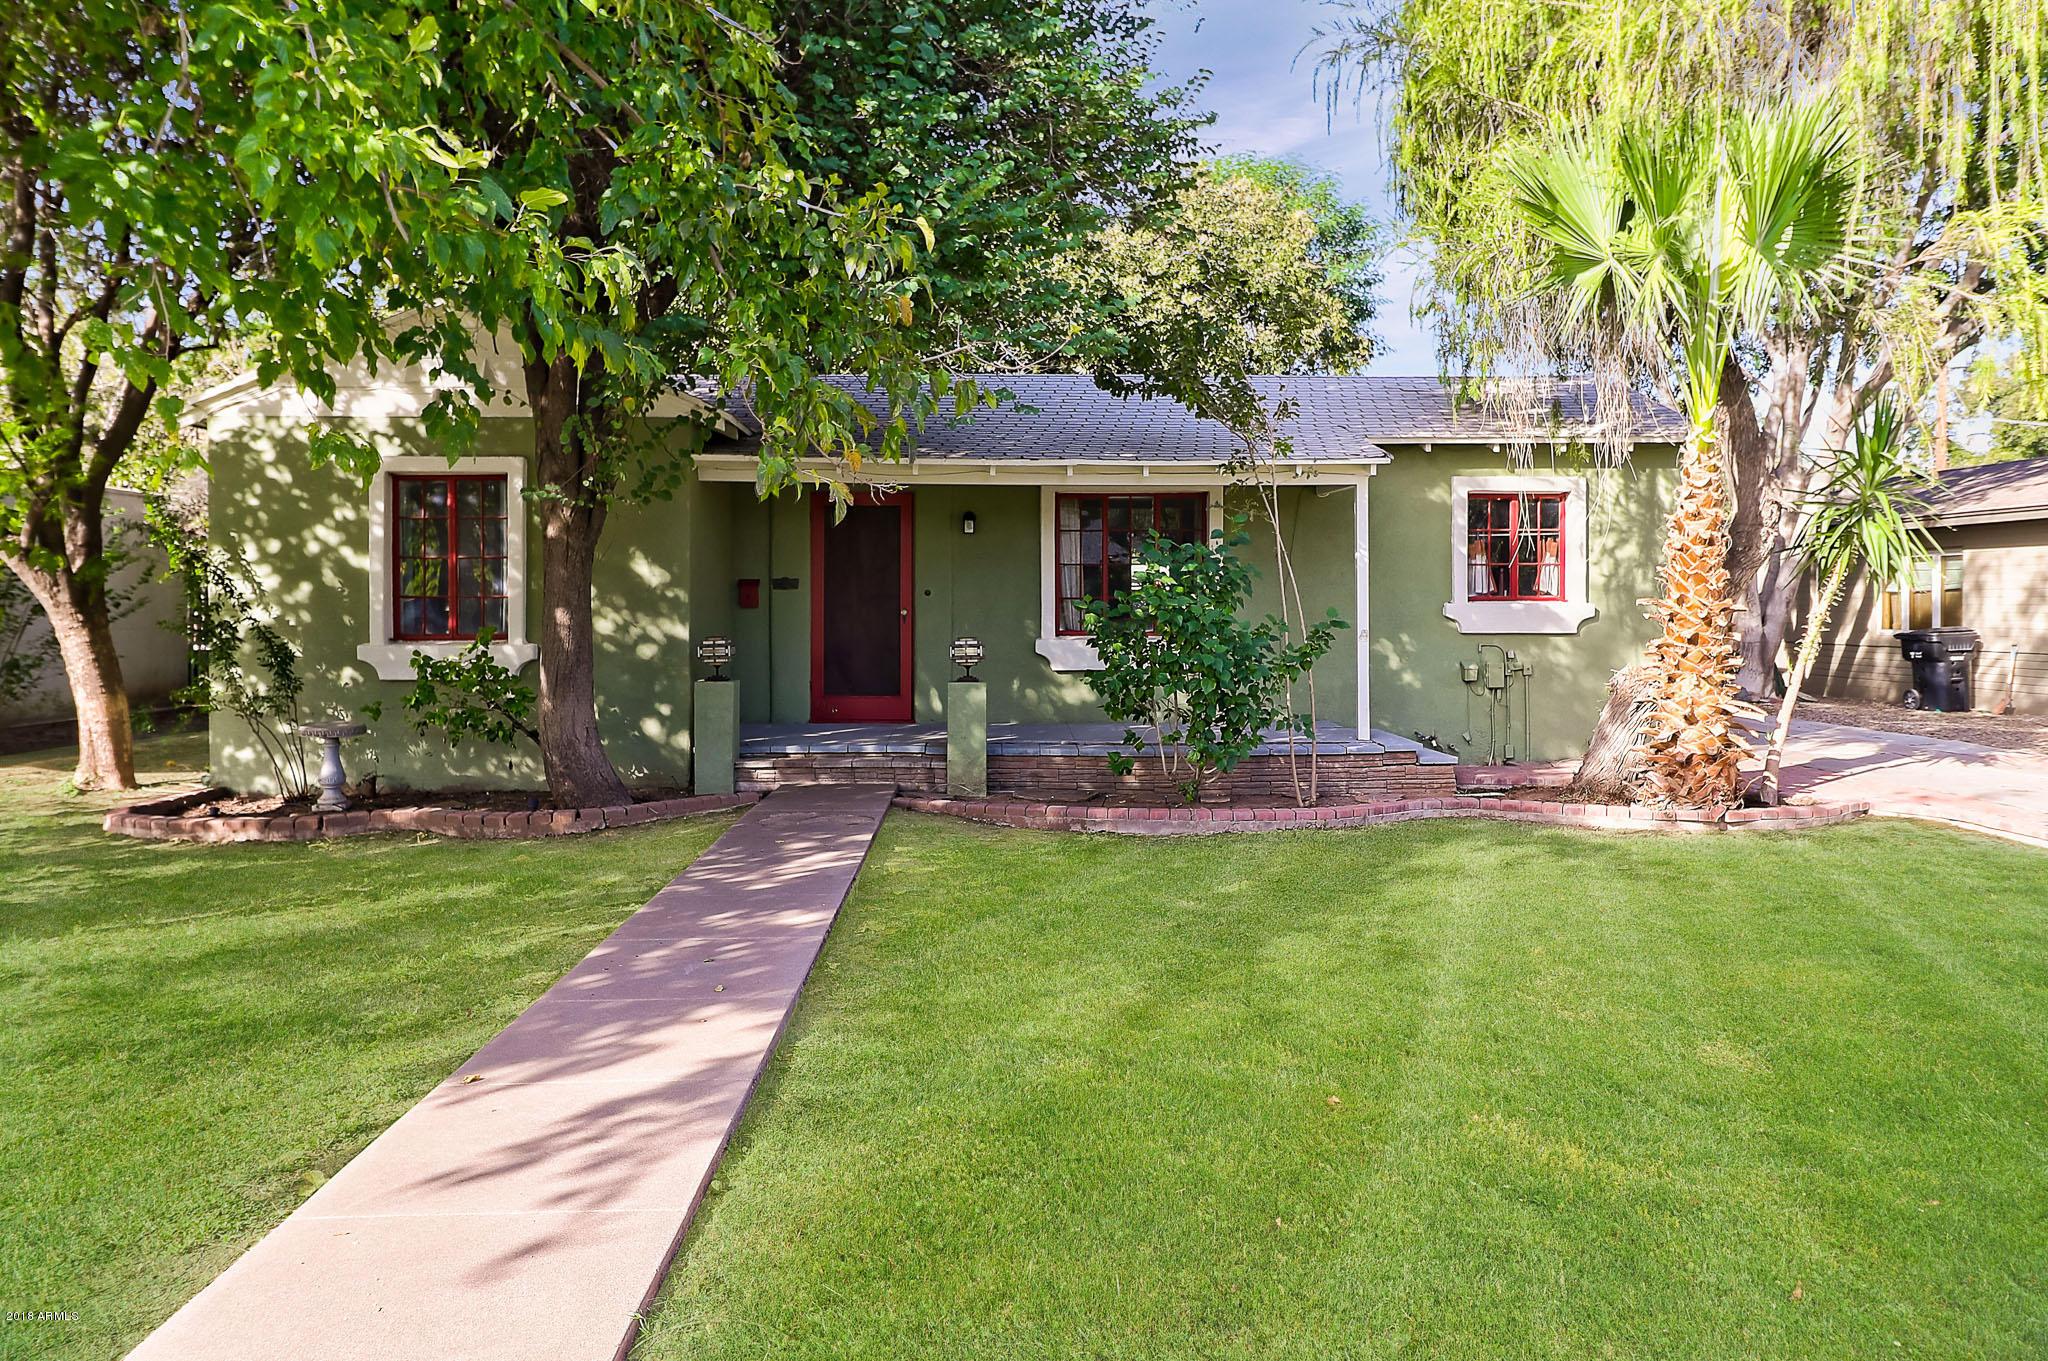 Photo of 1216 S MAPLE Avenue, Tempe, AZ 85281